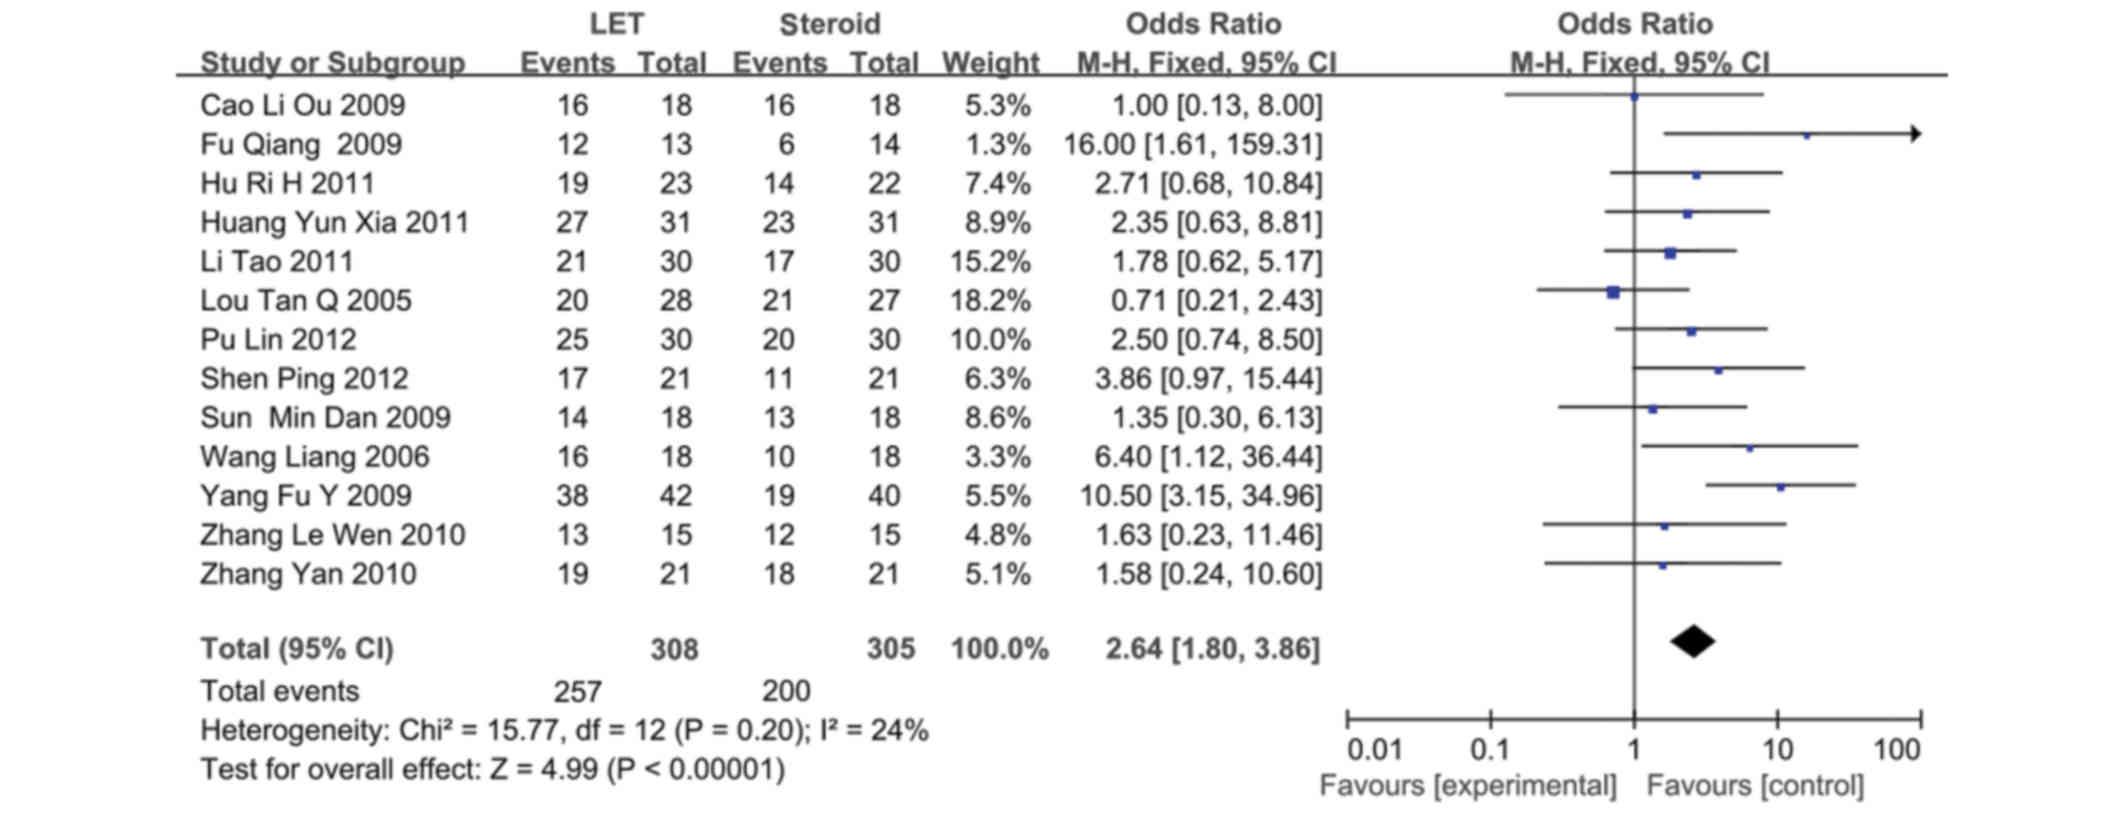 Immunosuppressive agents versus steroids in the treatment of